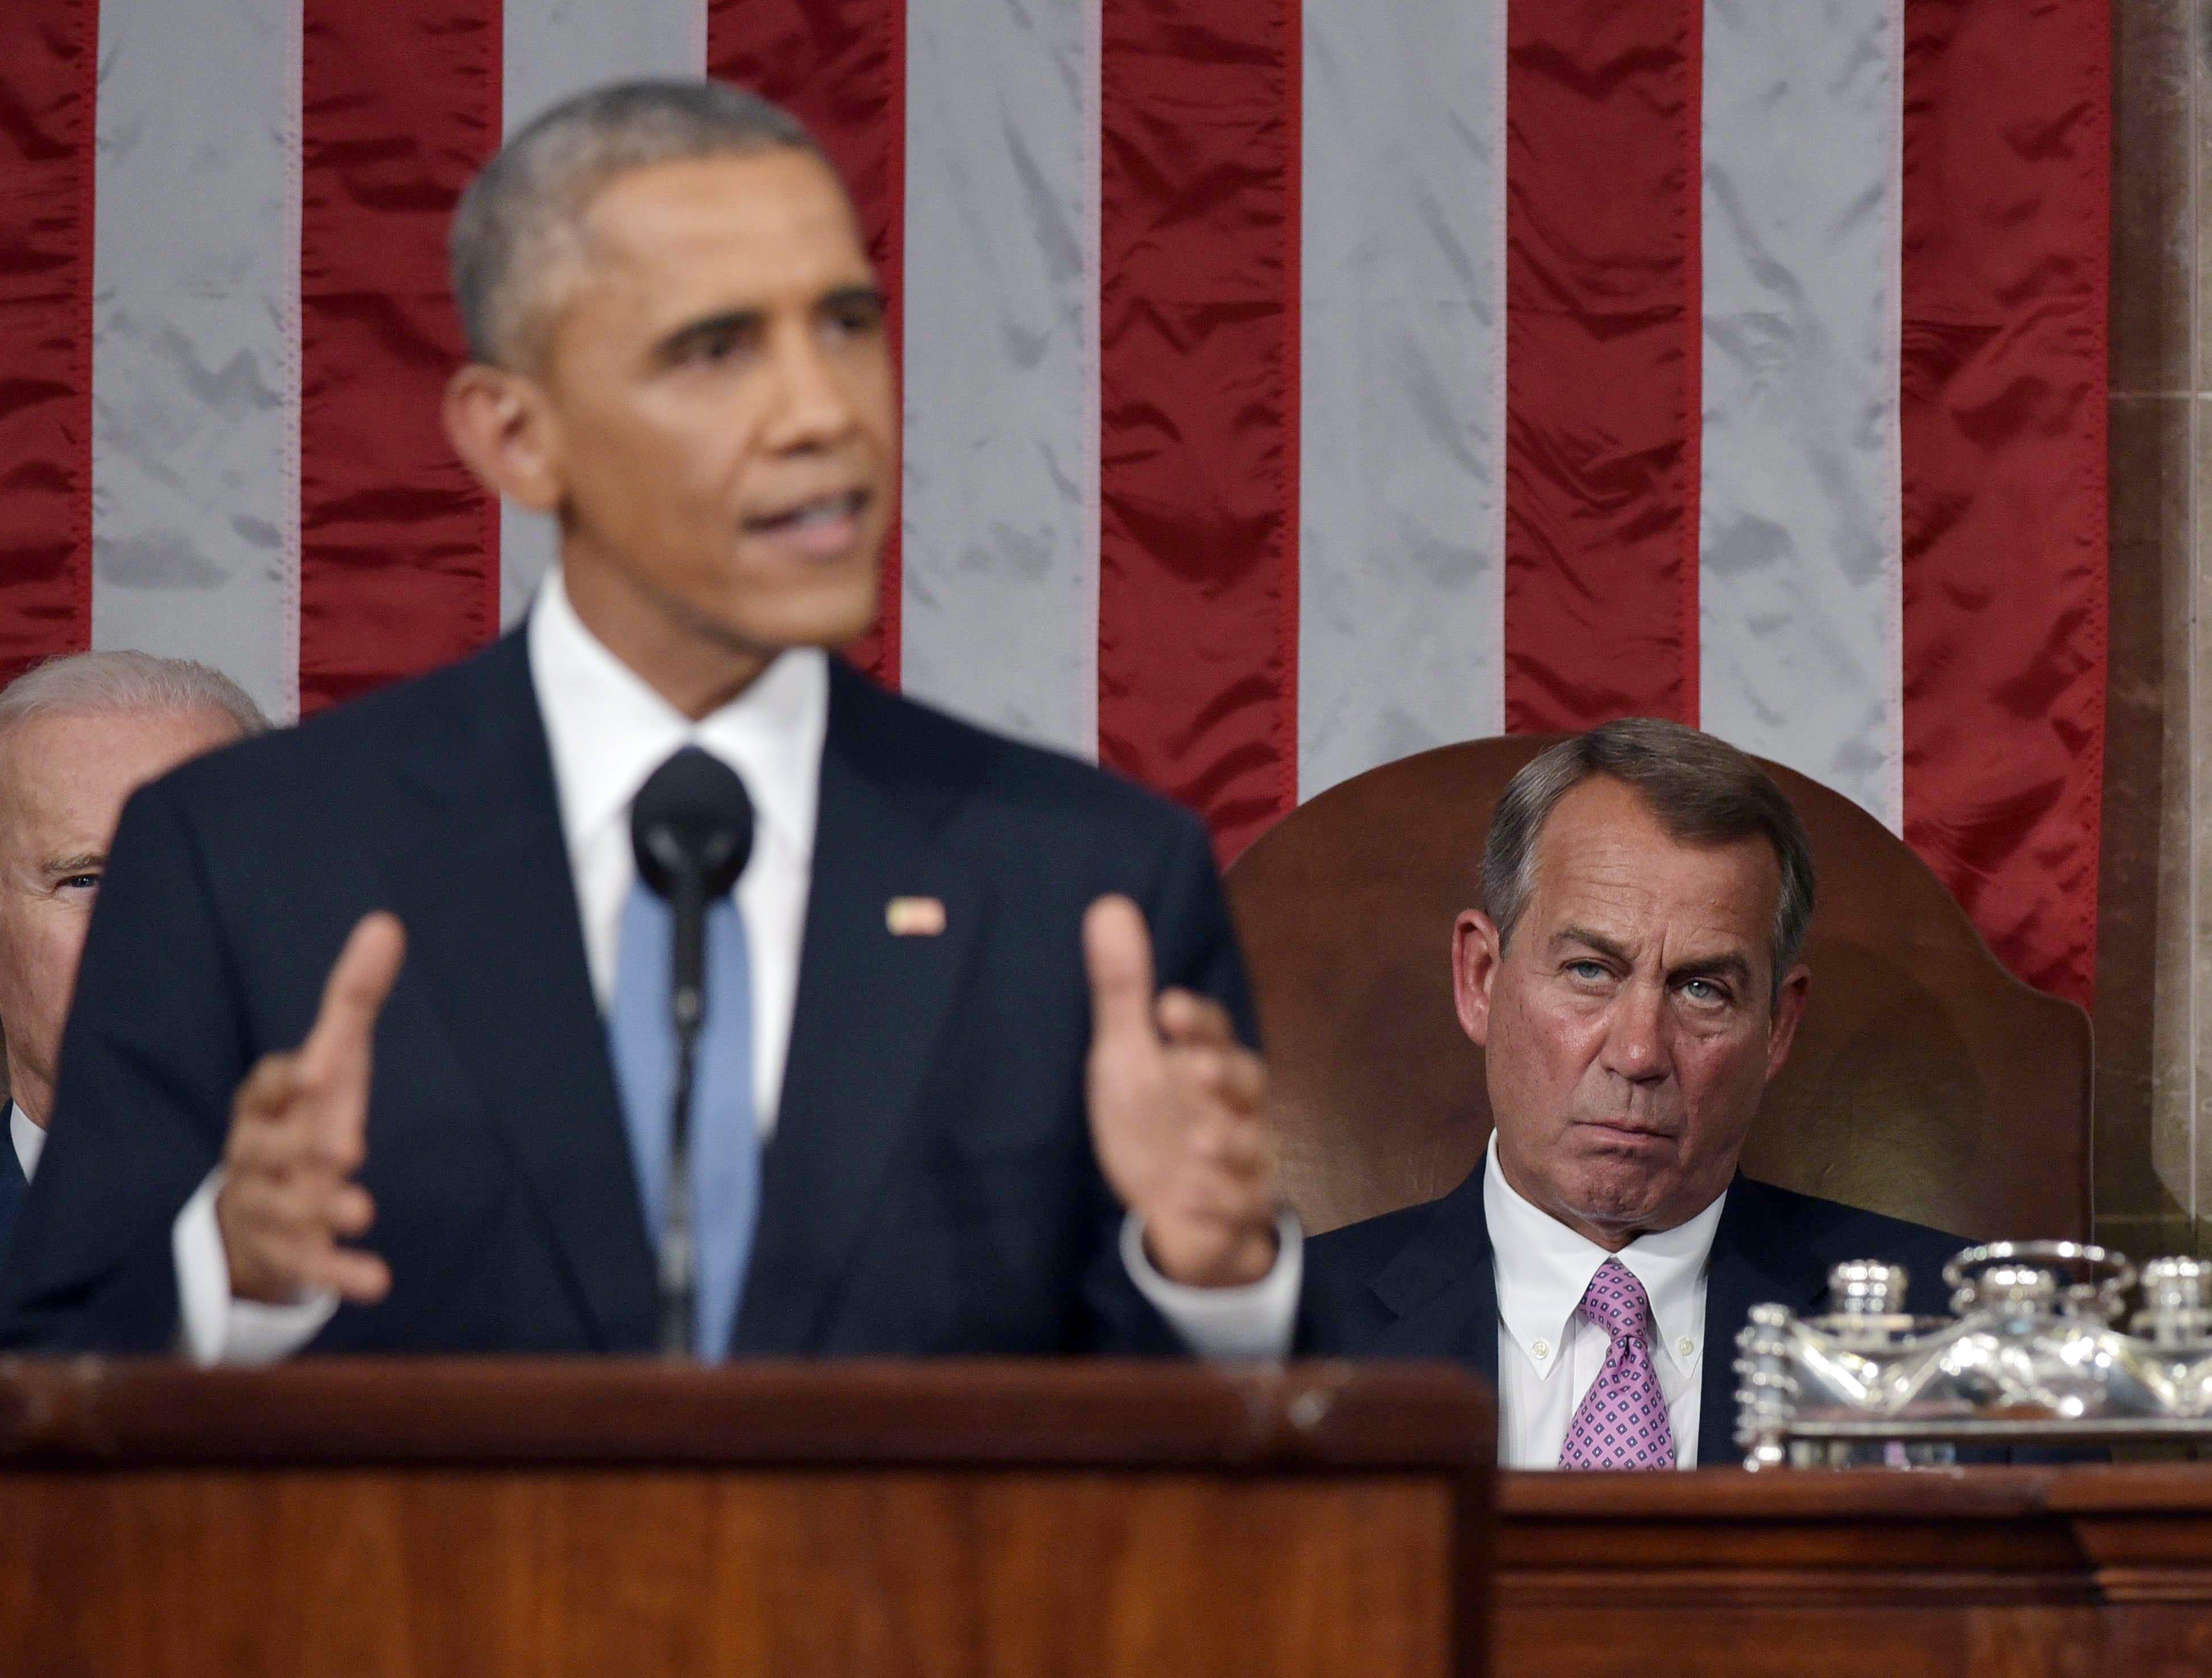 John Boehner listening to former President Barrack Obama deliver his State of the Union address.